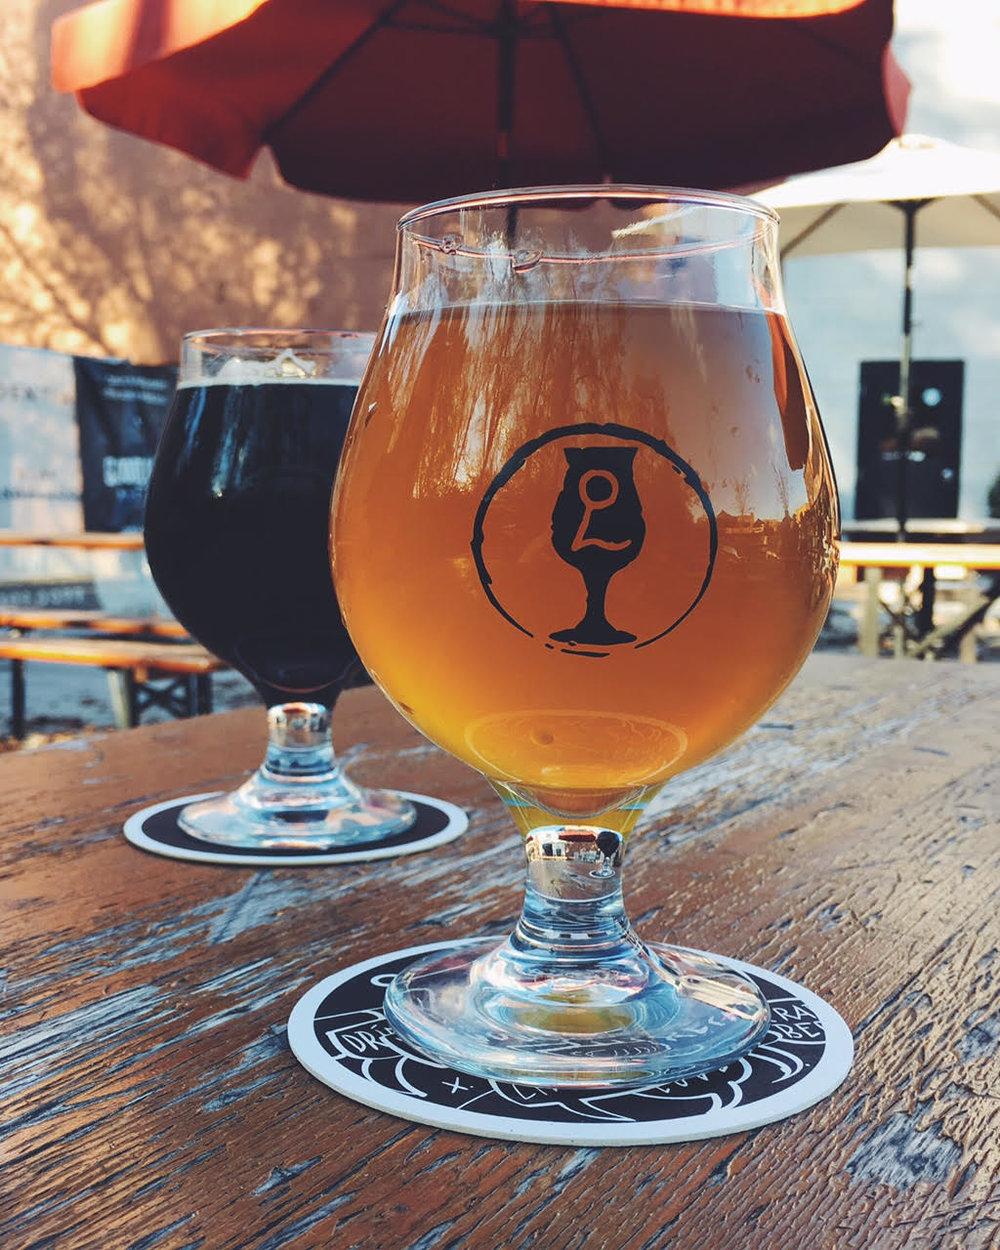 Pints at Ethereal Brewing in Lexington, Kentucky